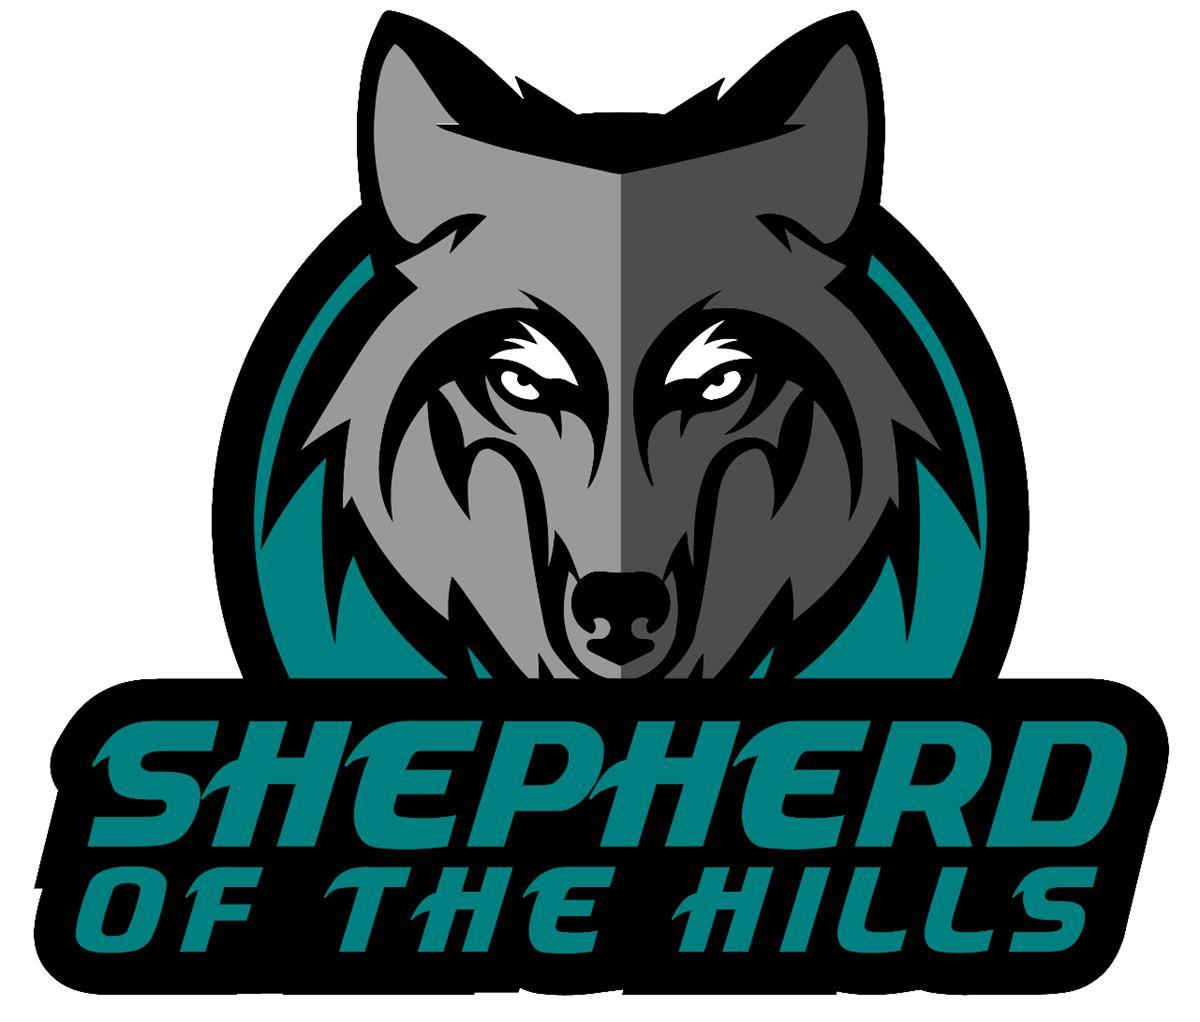 Shepherd of the Hill